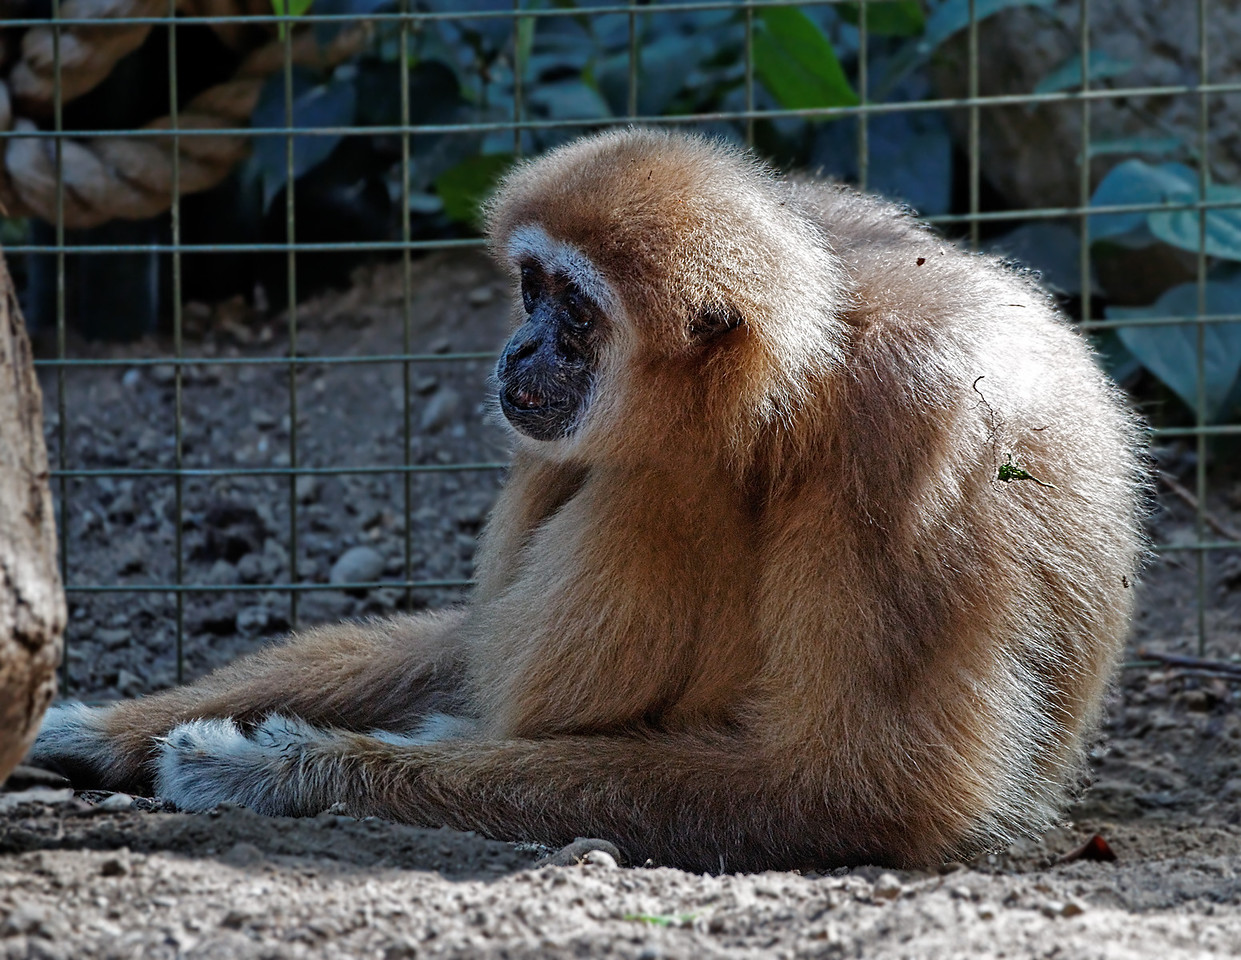 2011-06-10 - Toronto Zoo - 019